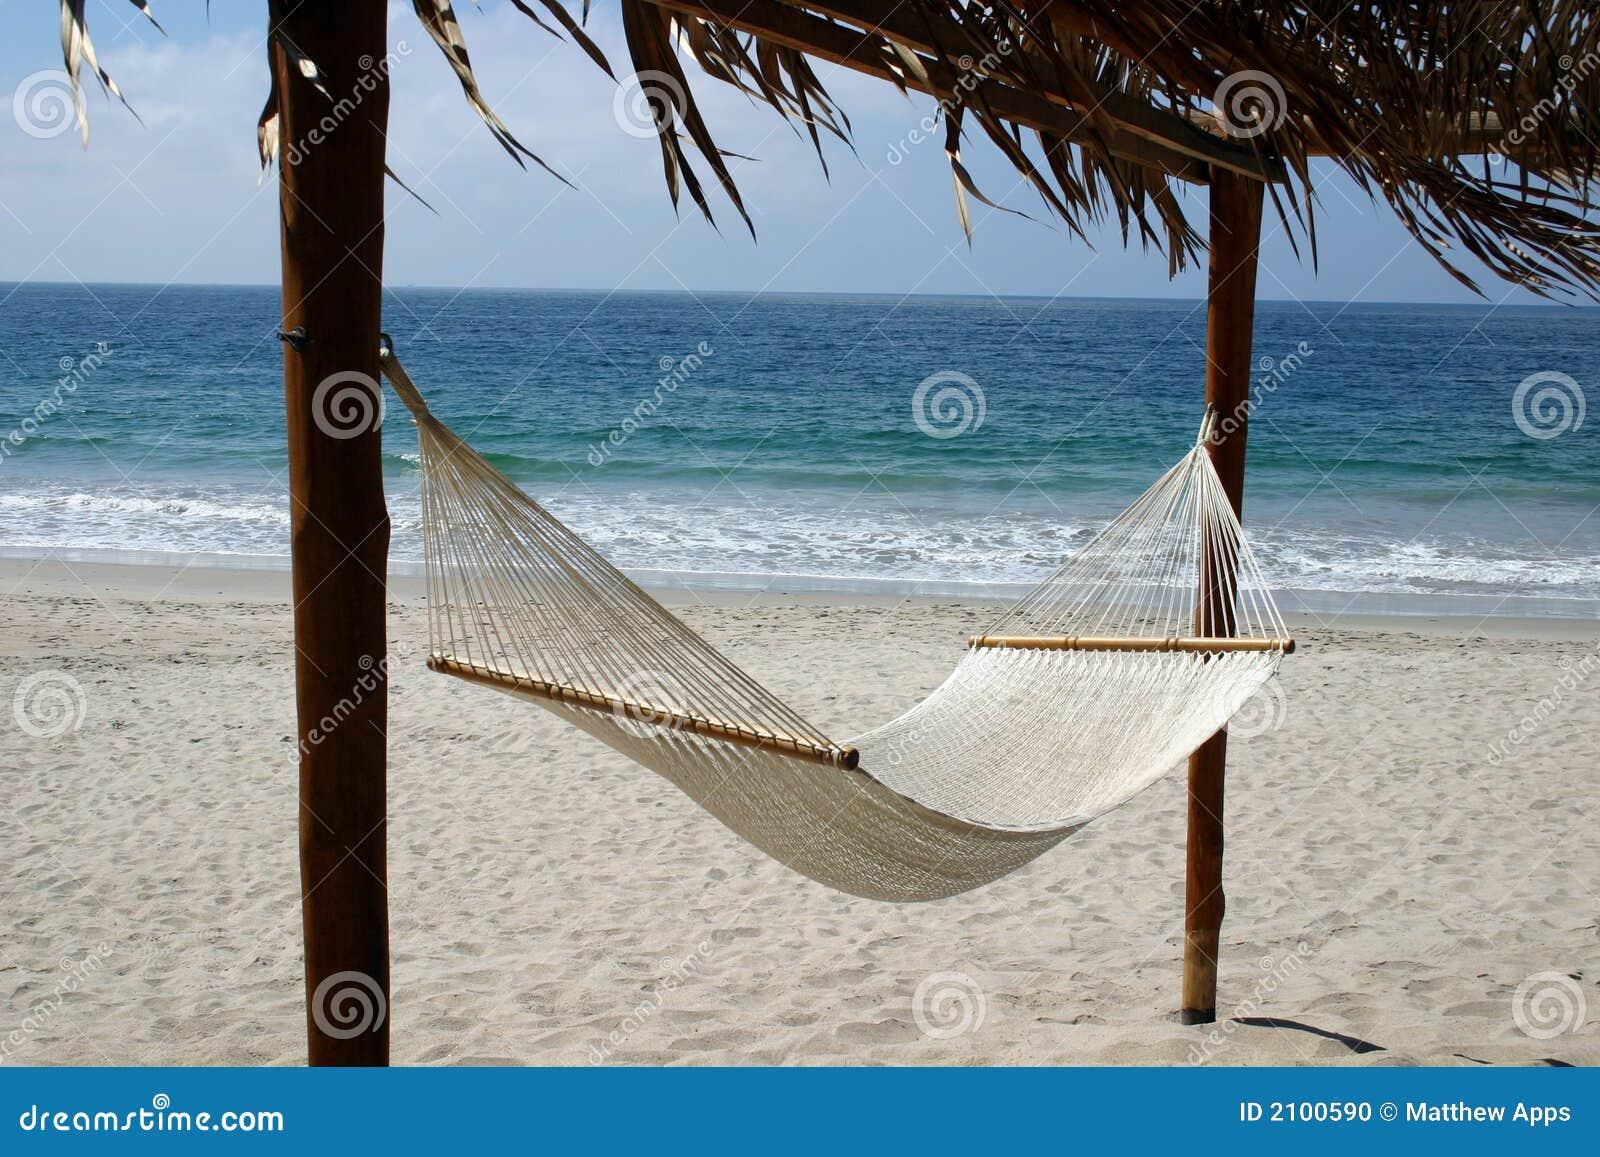 Inviting Hammock On The Beach Stock Photo - Image: 2100590